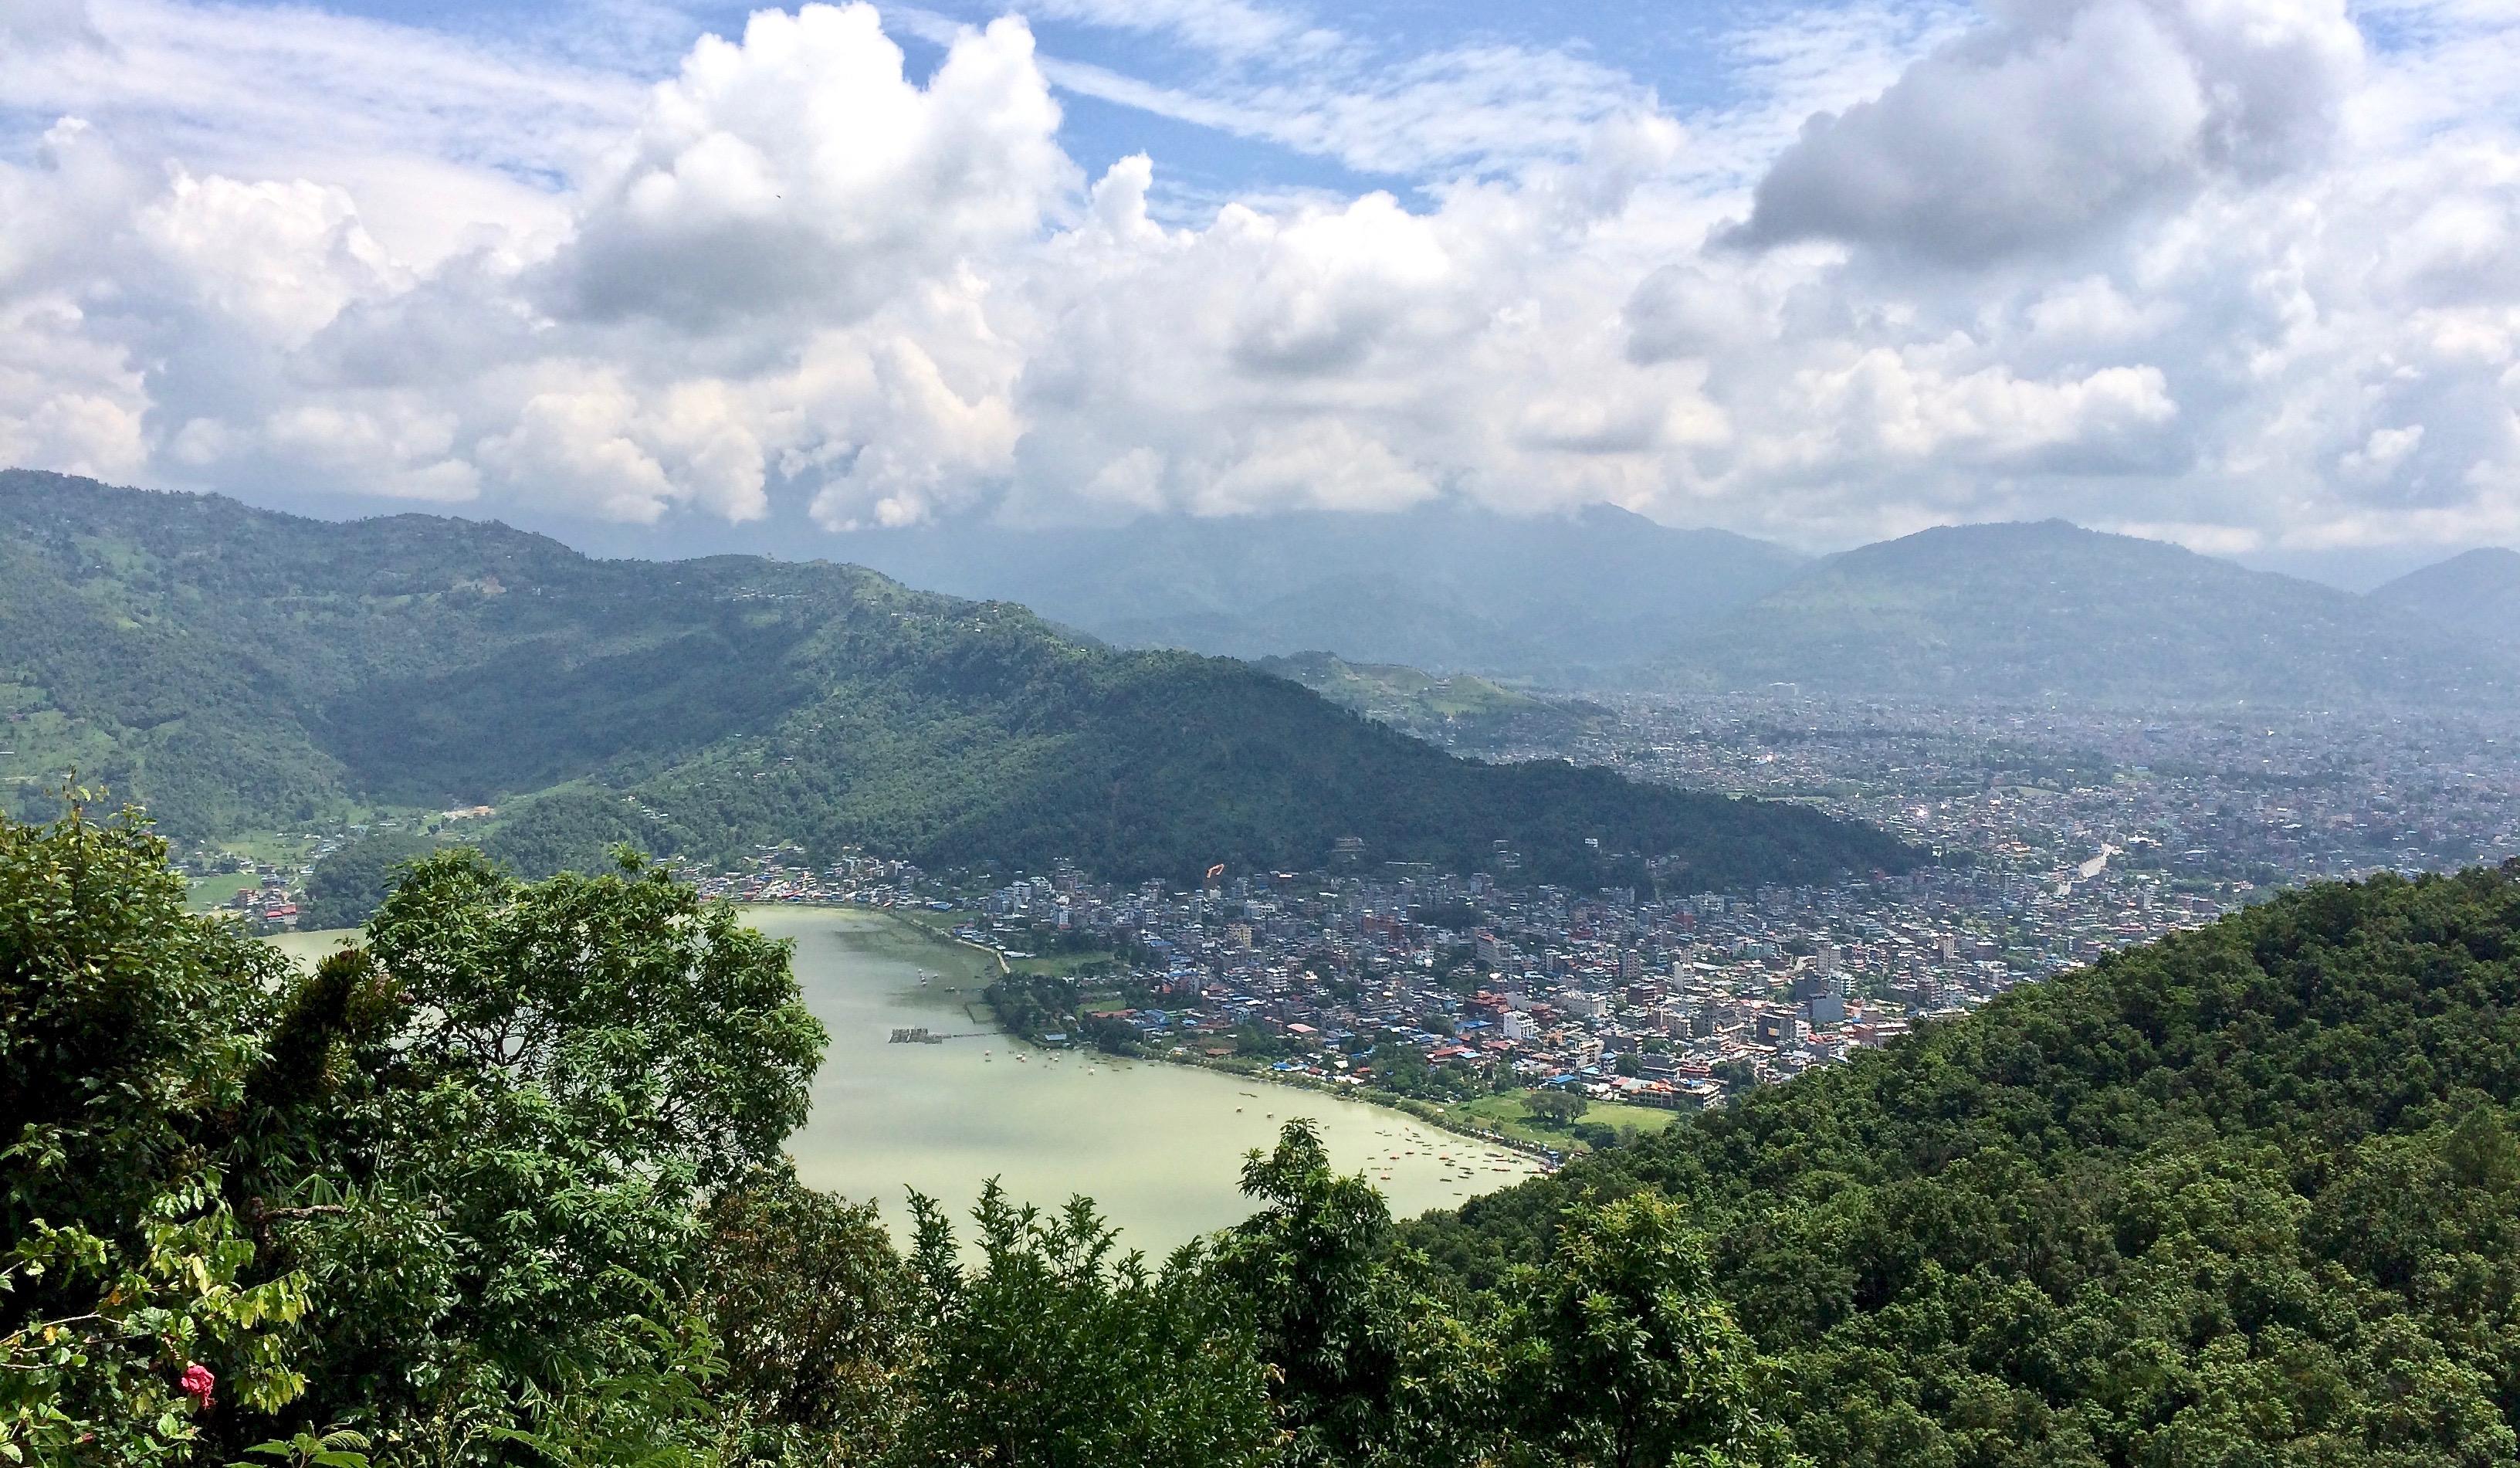 Pokhara town from the World Peace Pagoda